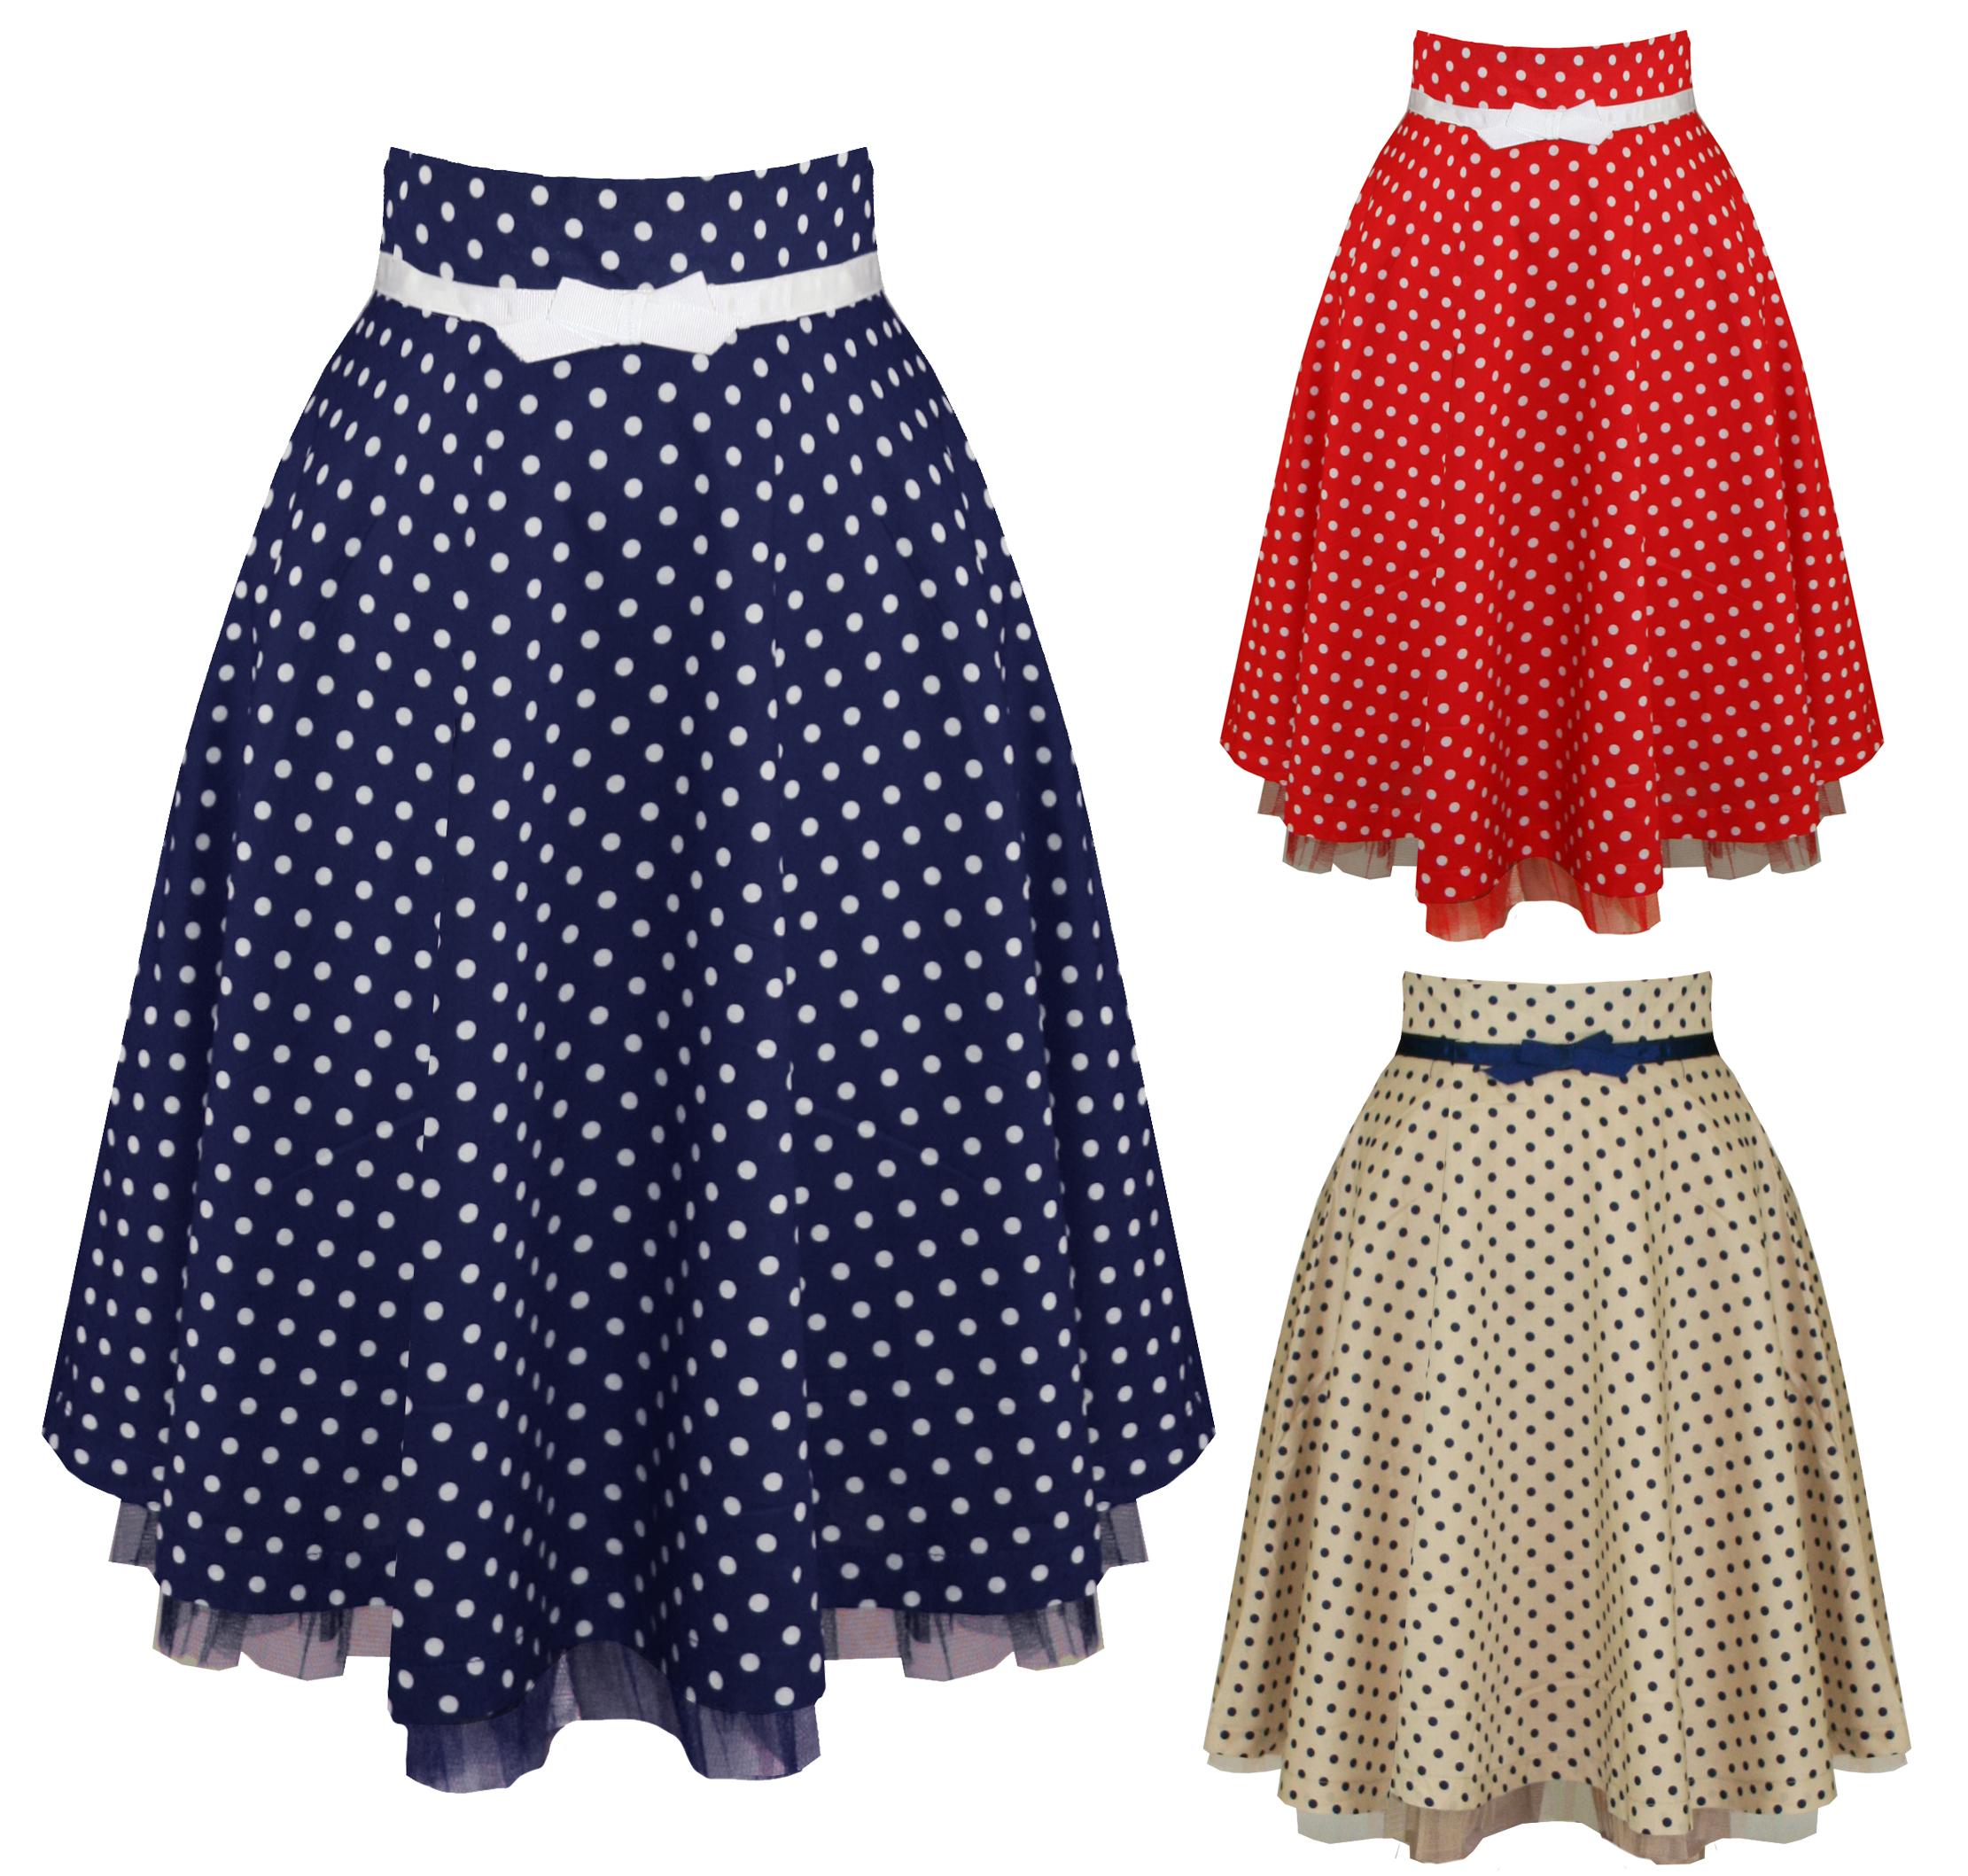 Как сшить юбку стиляги фото